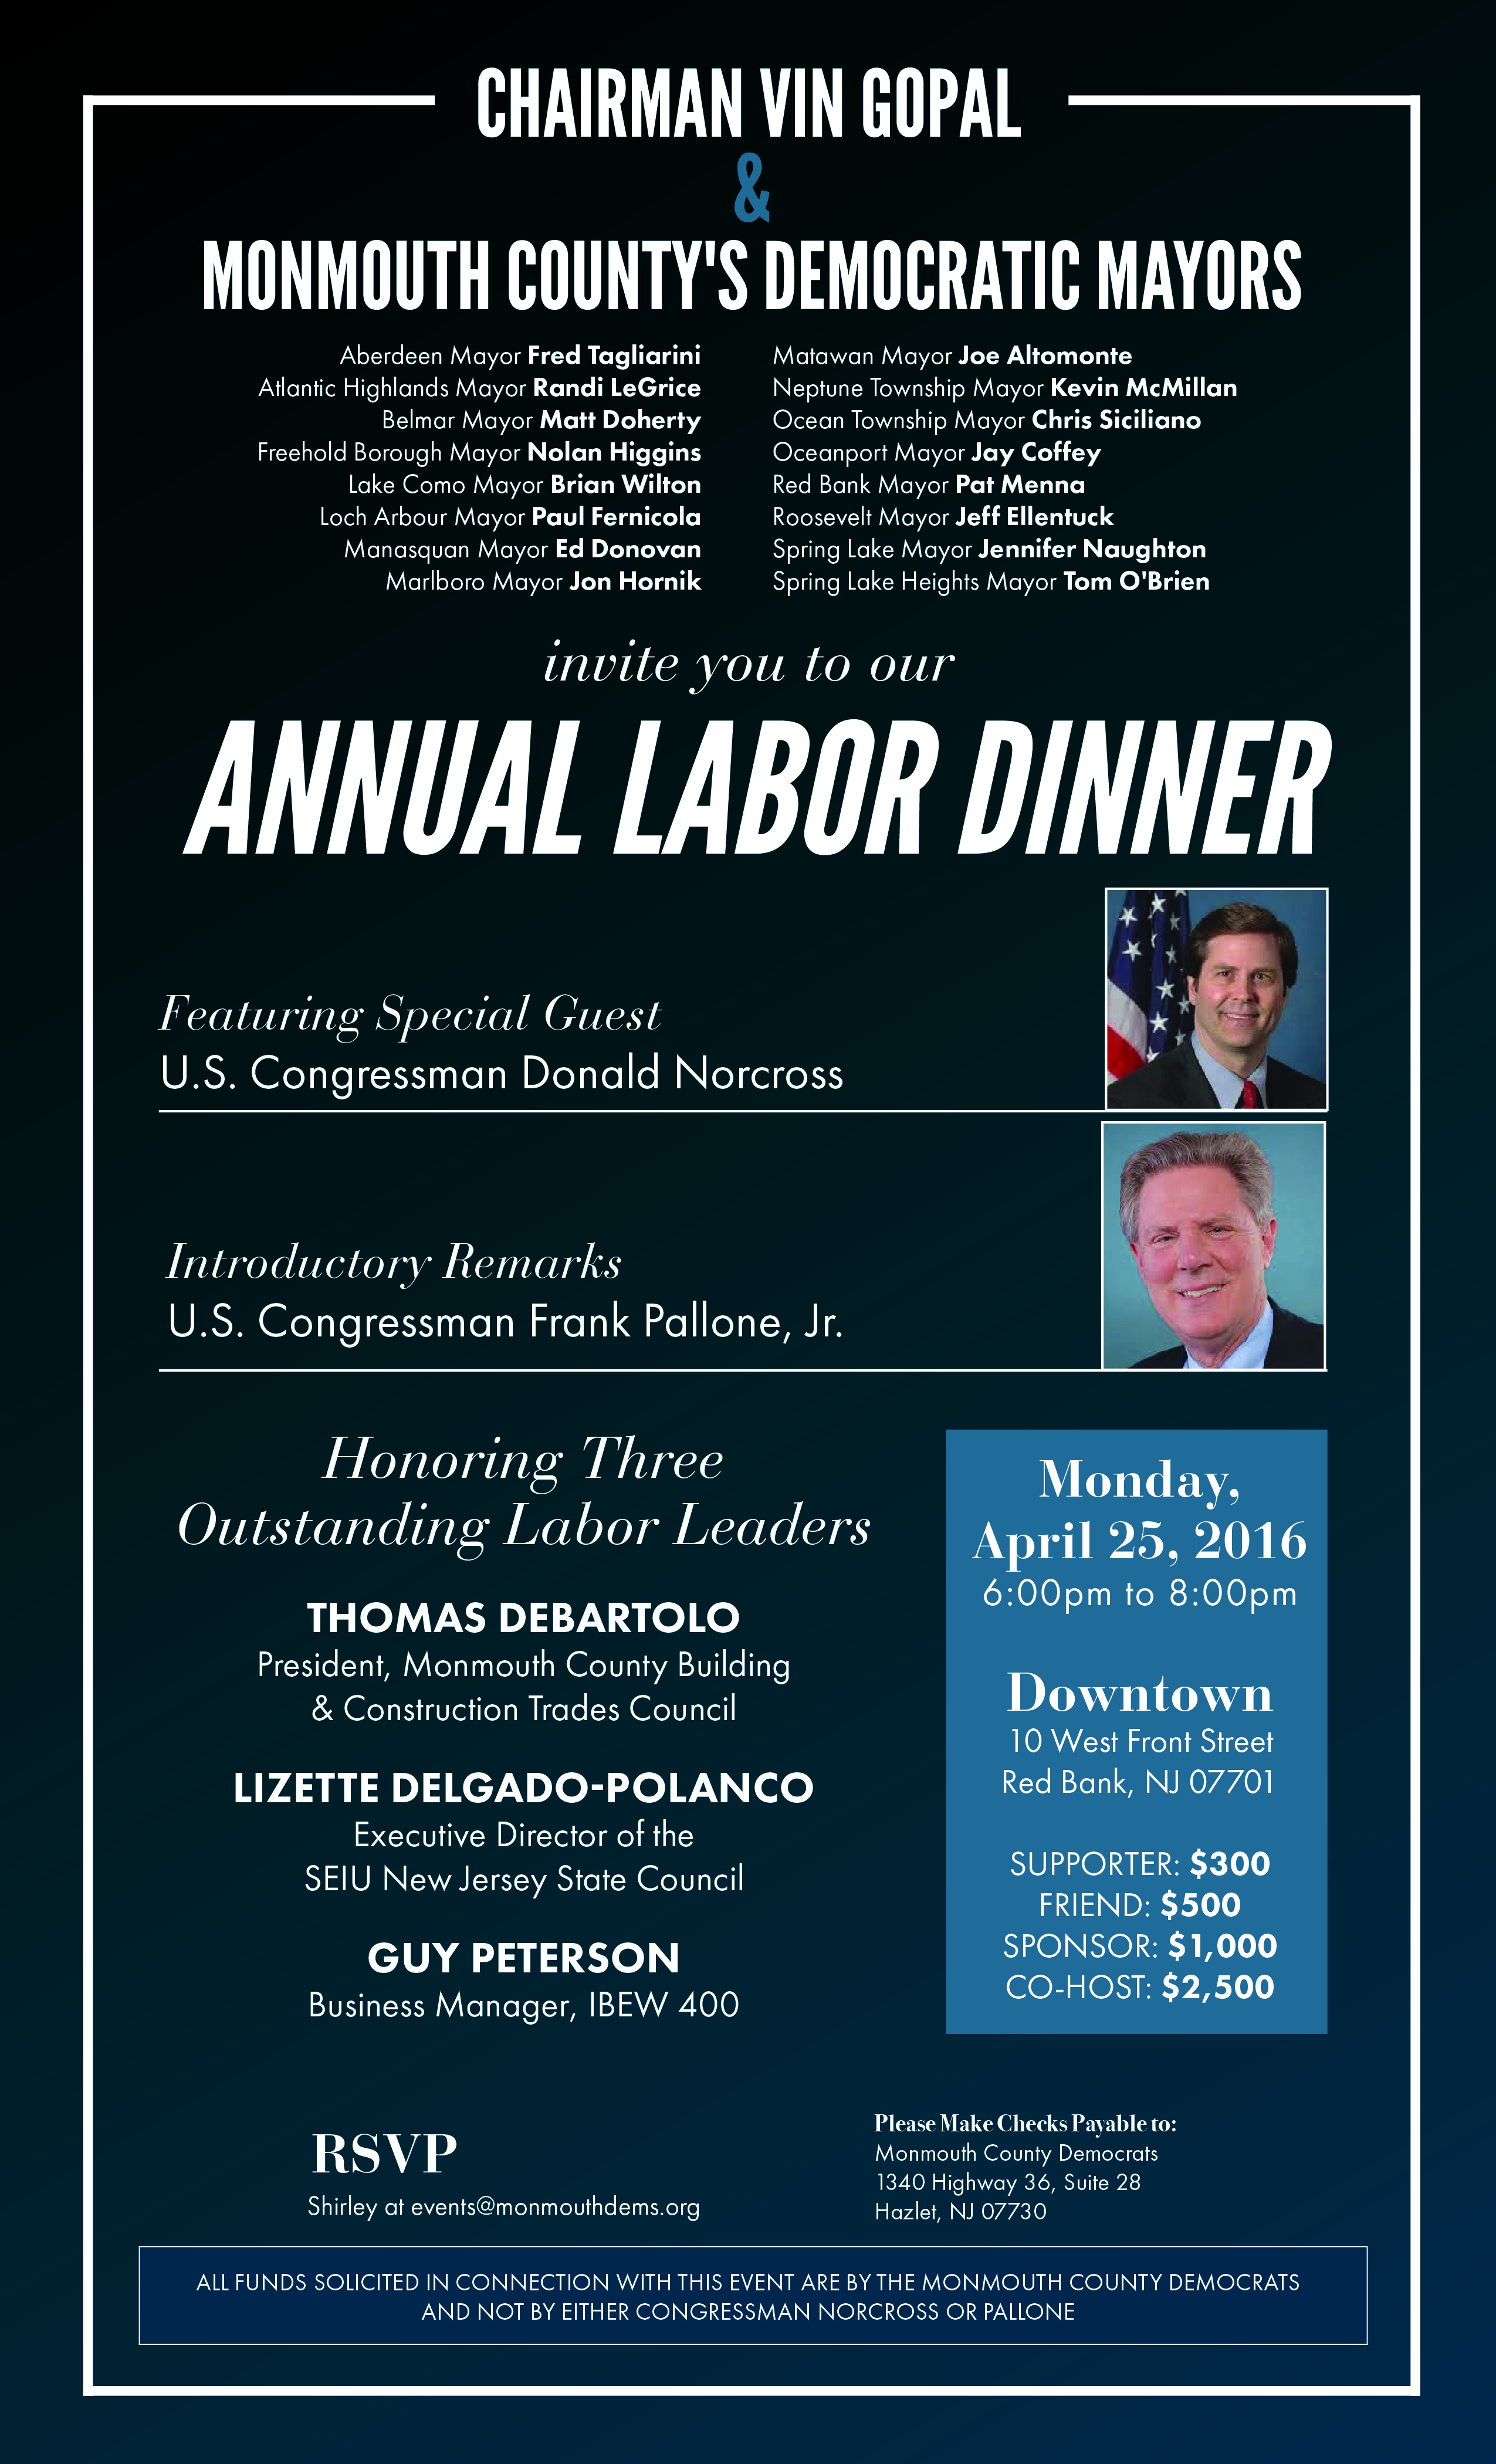 MCD-Annual-Labor-Dinner_(1)_(1).jpg